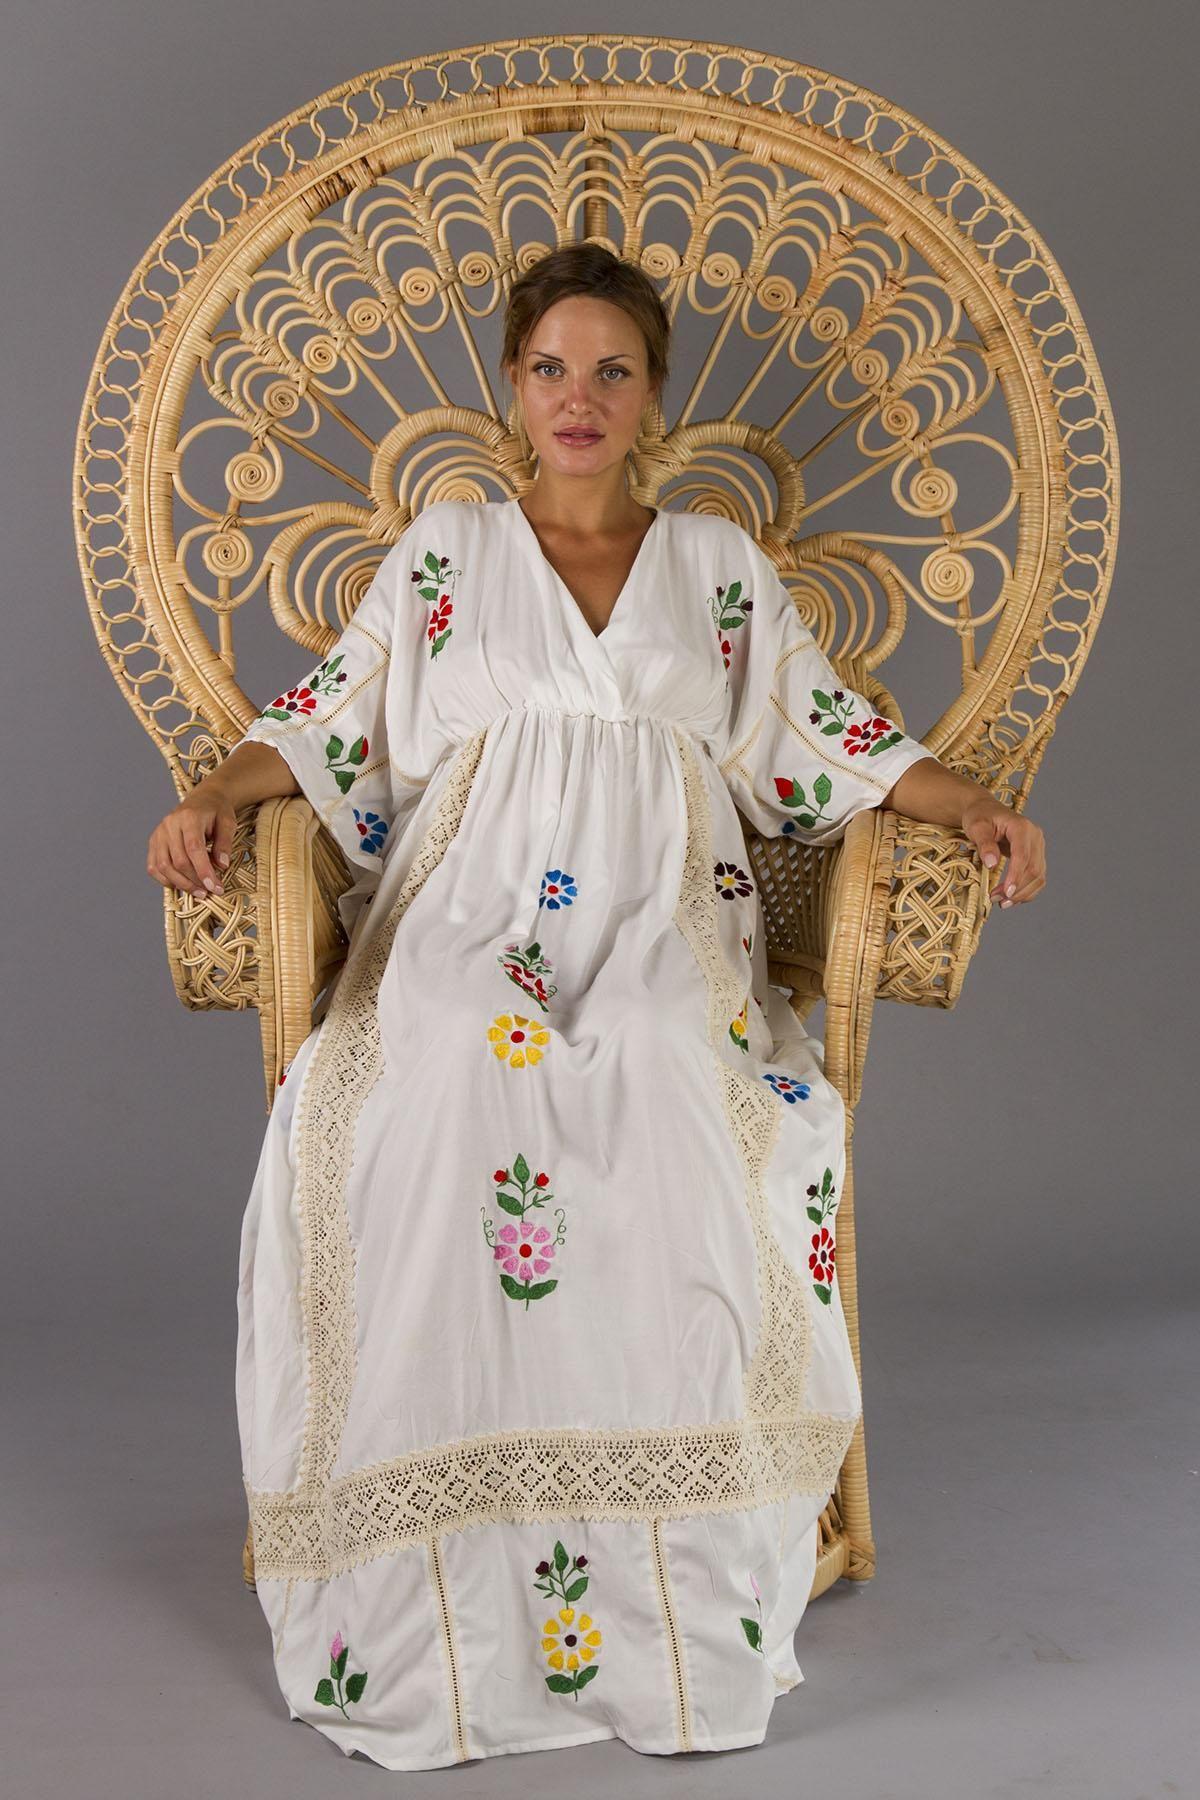 Bermain maternity maxi dress folk style embroidery with crochet bermain maternity maxi dress folk style embroidery with crochet fillyboo boho inspired ombrellifo Image collections